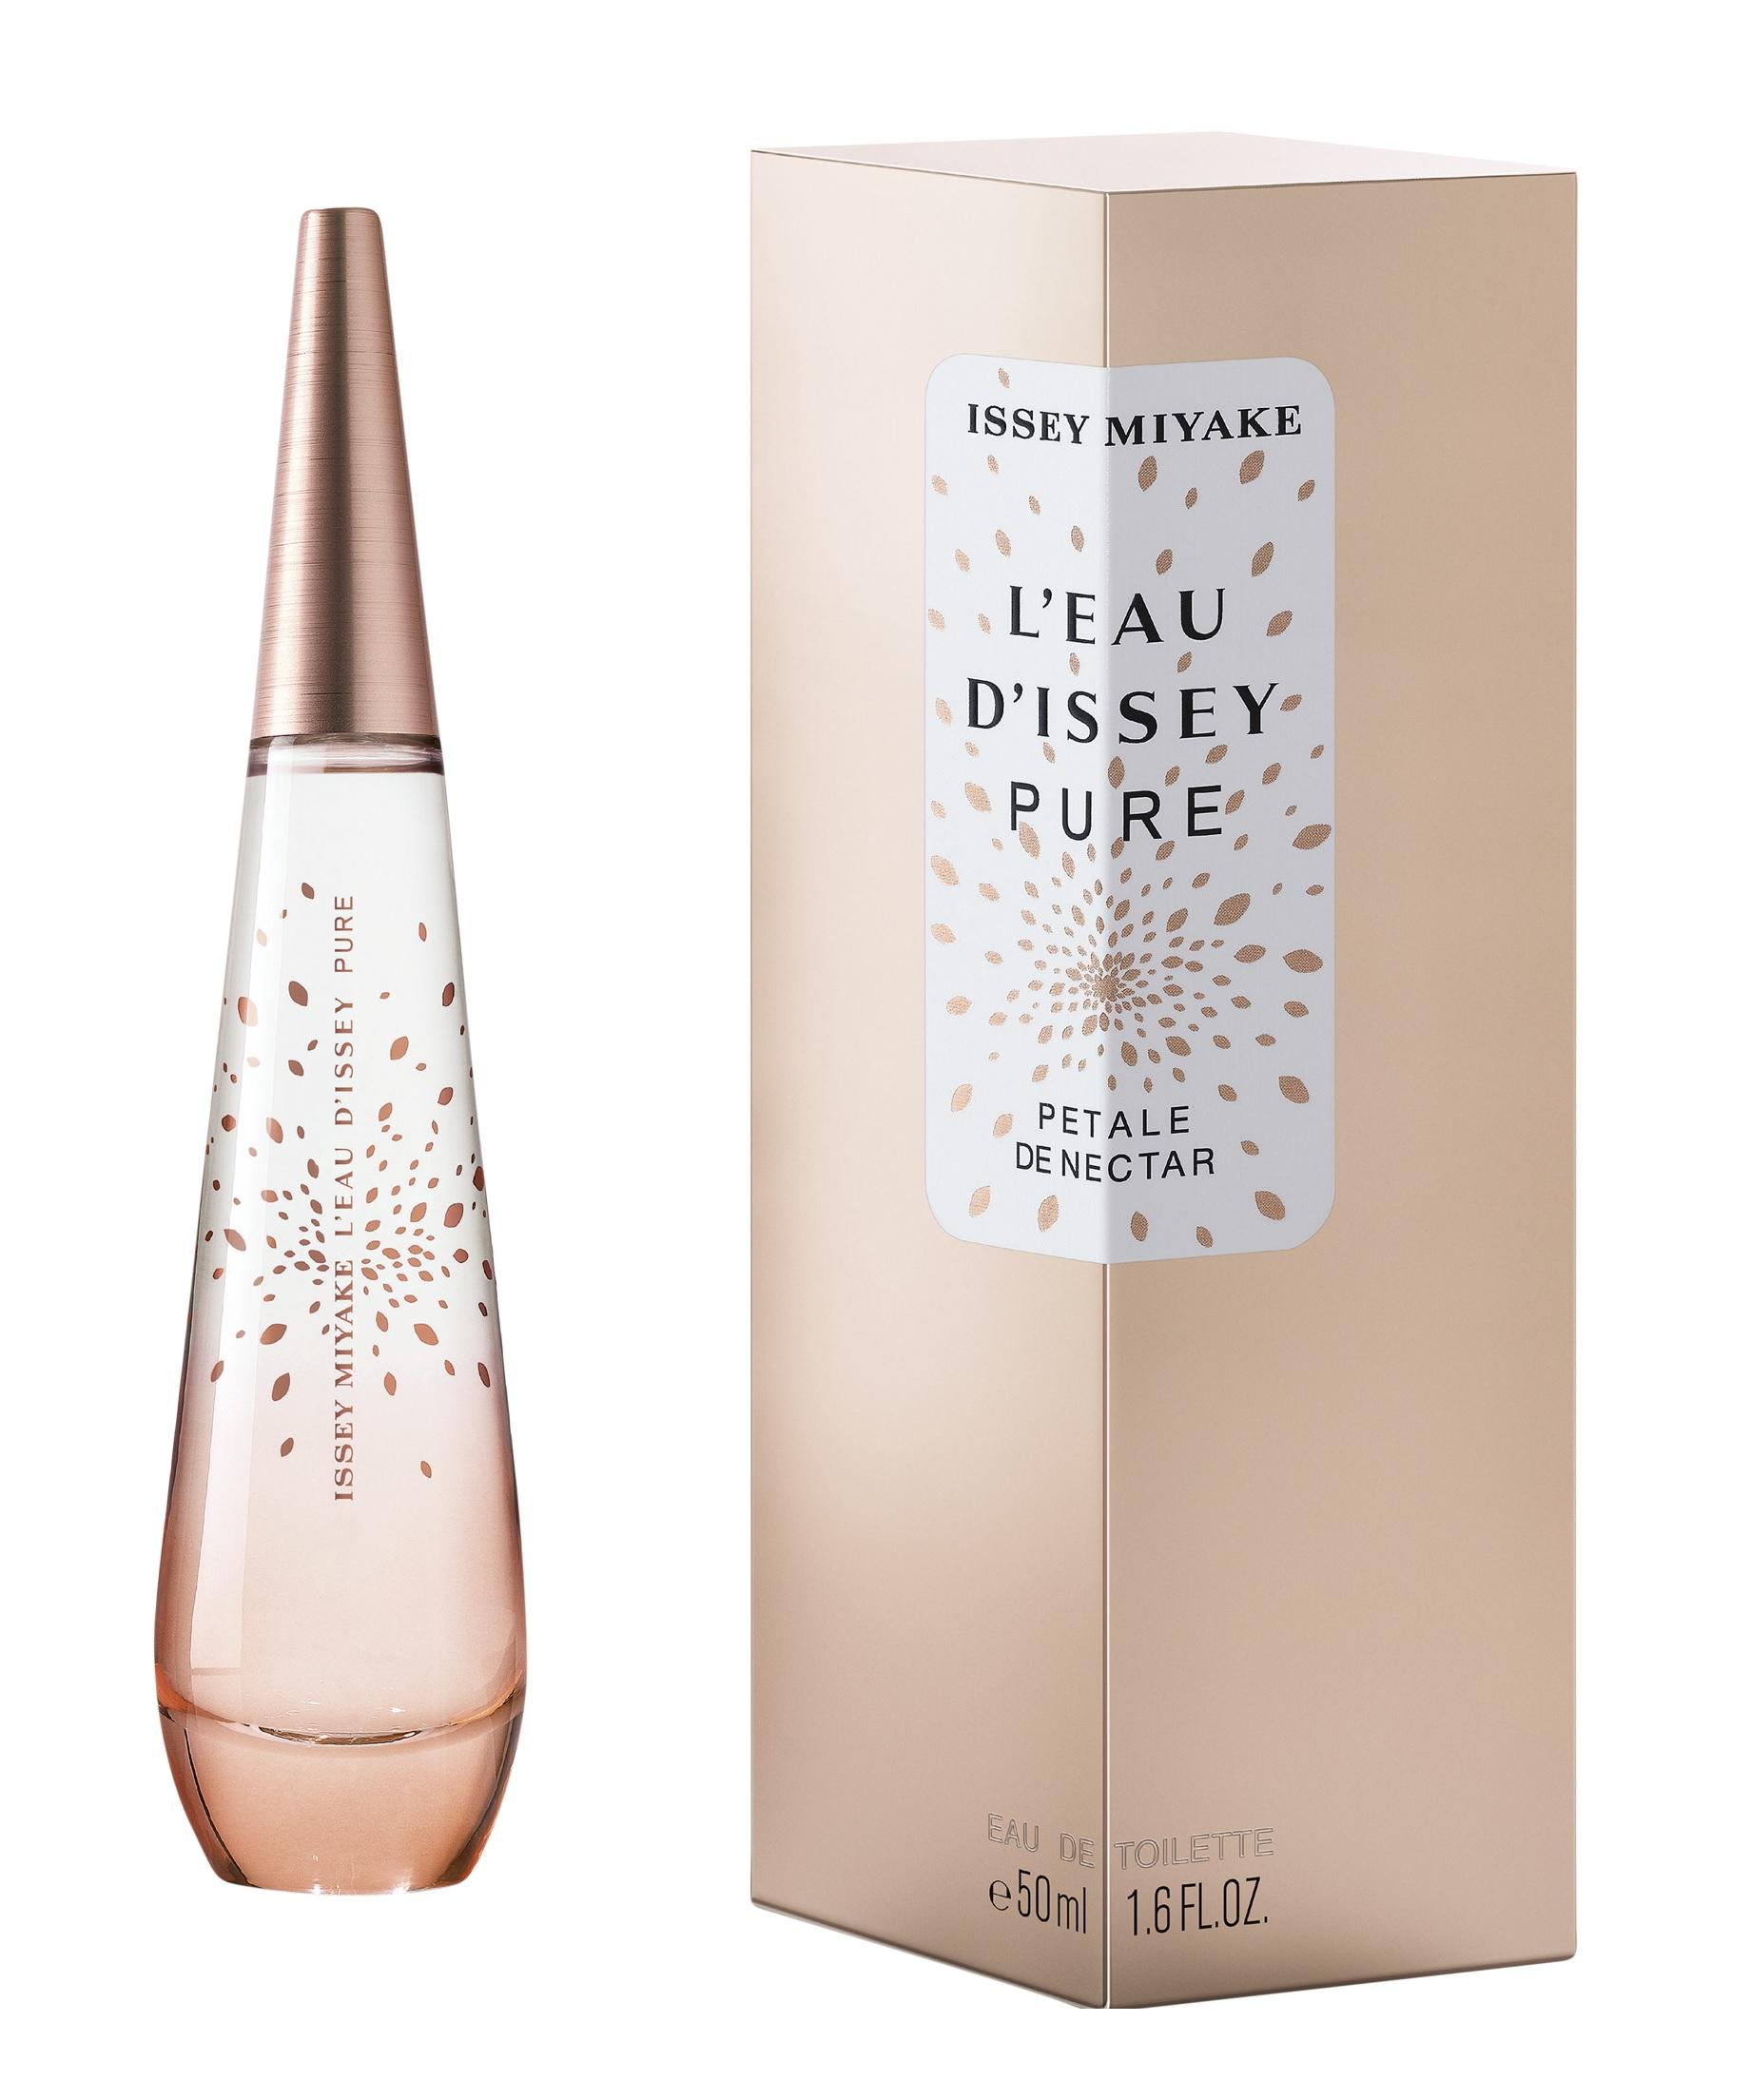 ca18b5d22 Issey Miyake L Eau d Issey Pure Petale de Nectar ~ New Fragrances